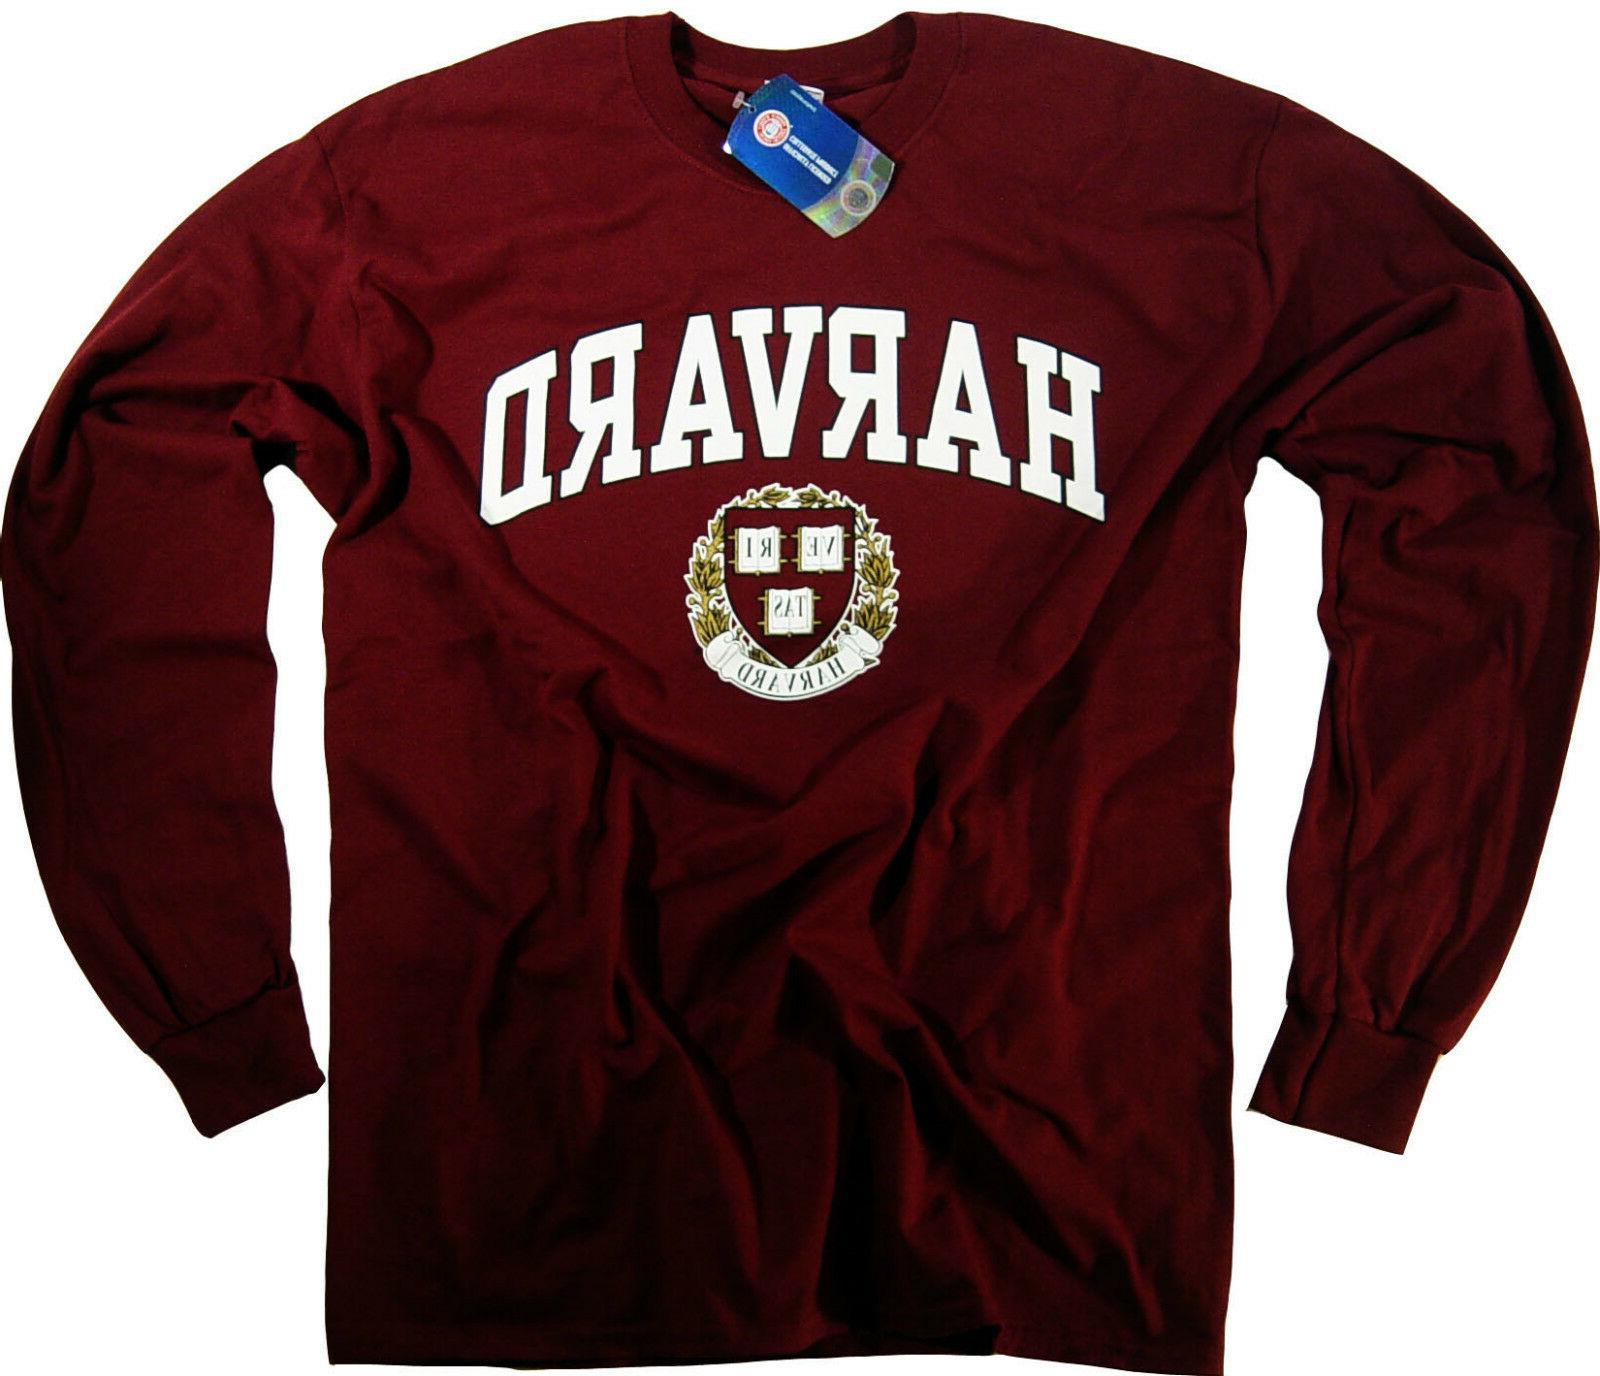 harvard shirt t shirt university apparel